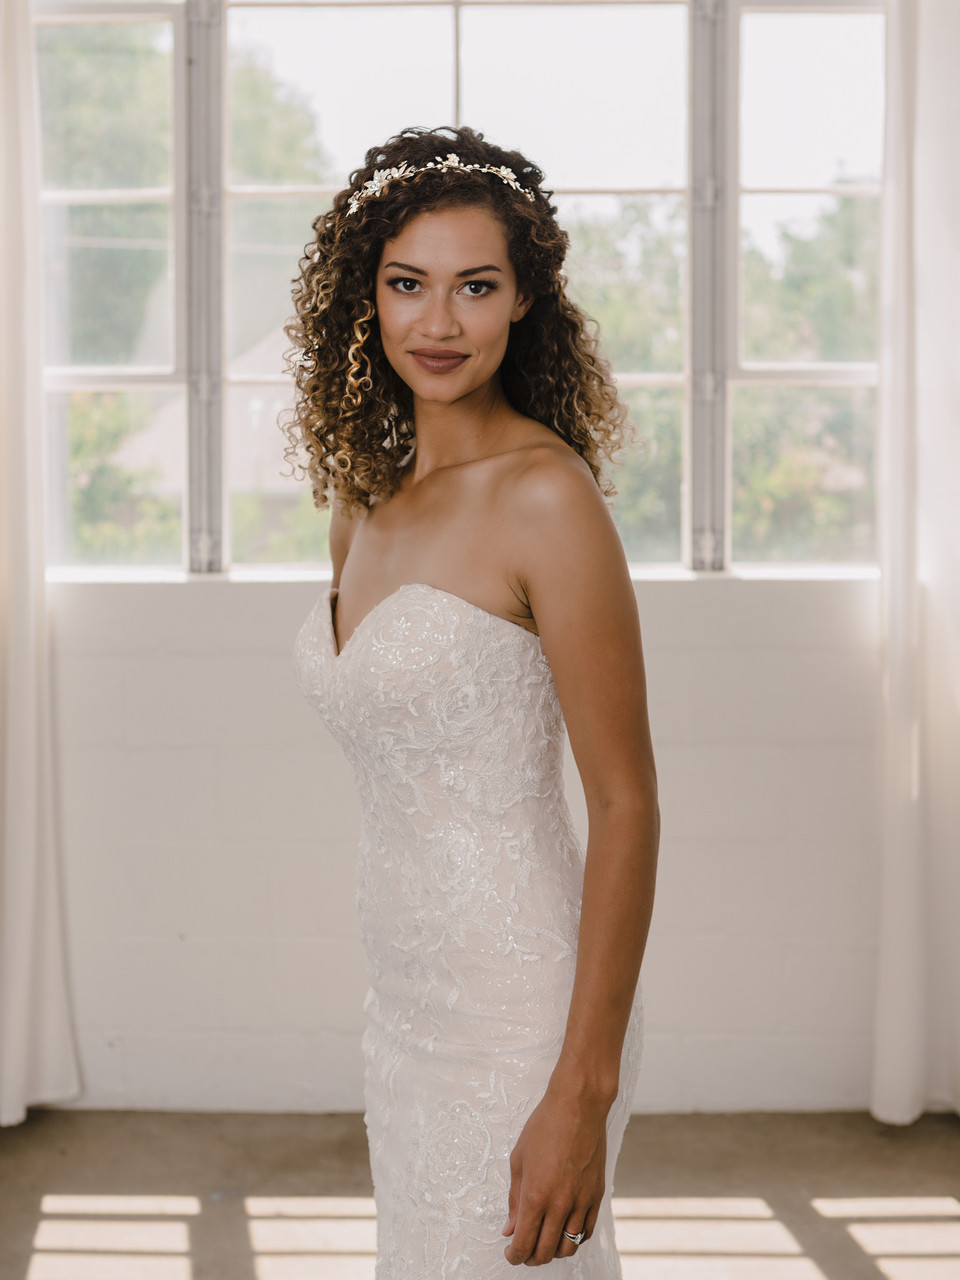 En Vogue Bridal Hair Jewelry HB2115 - Rhodium plated